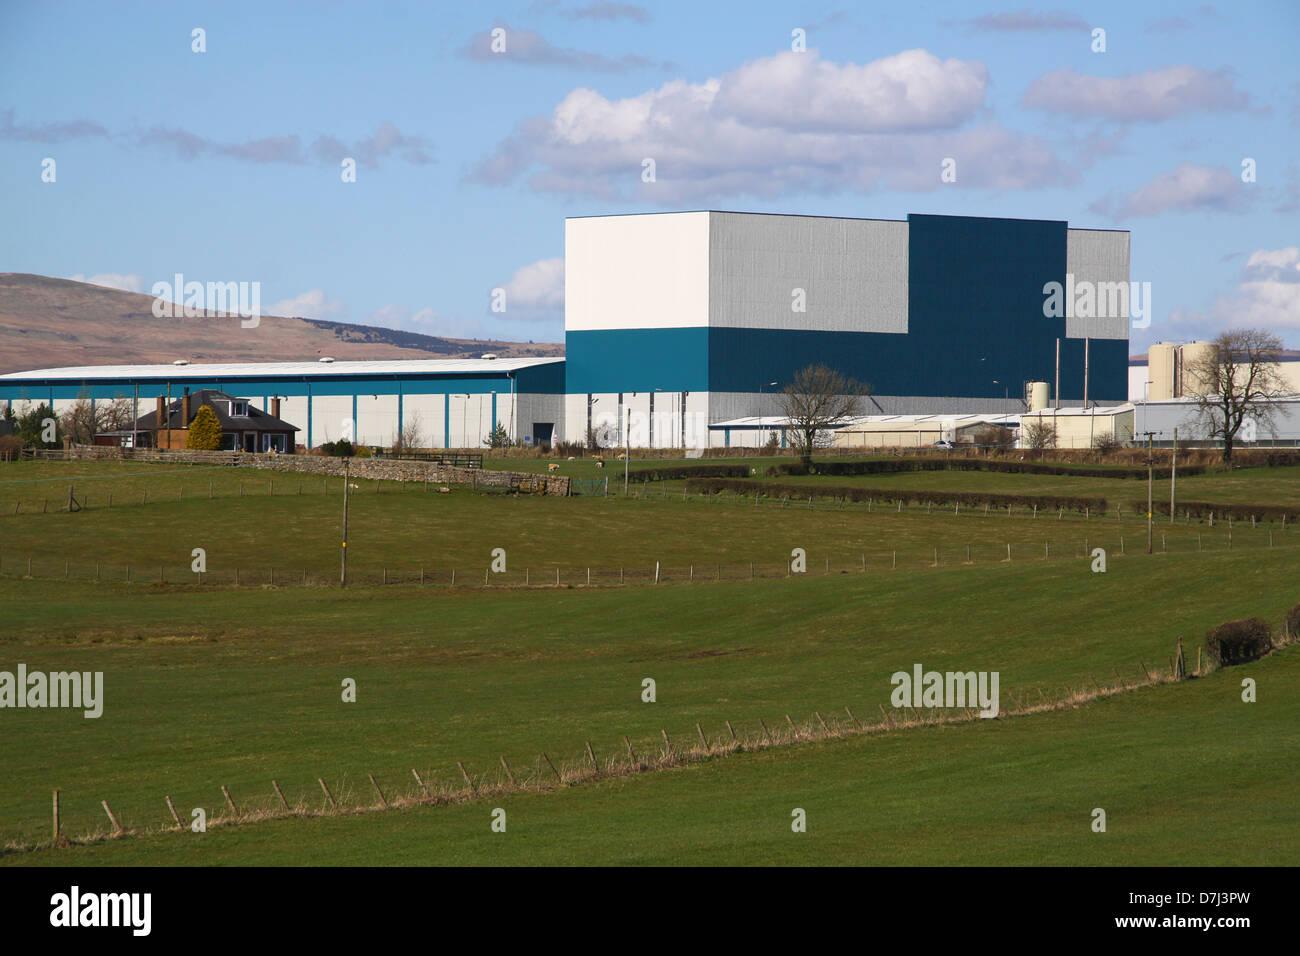 Irn Bru Factory Cumbernauld Tour